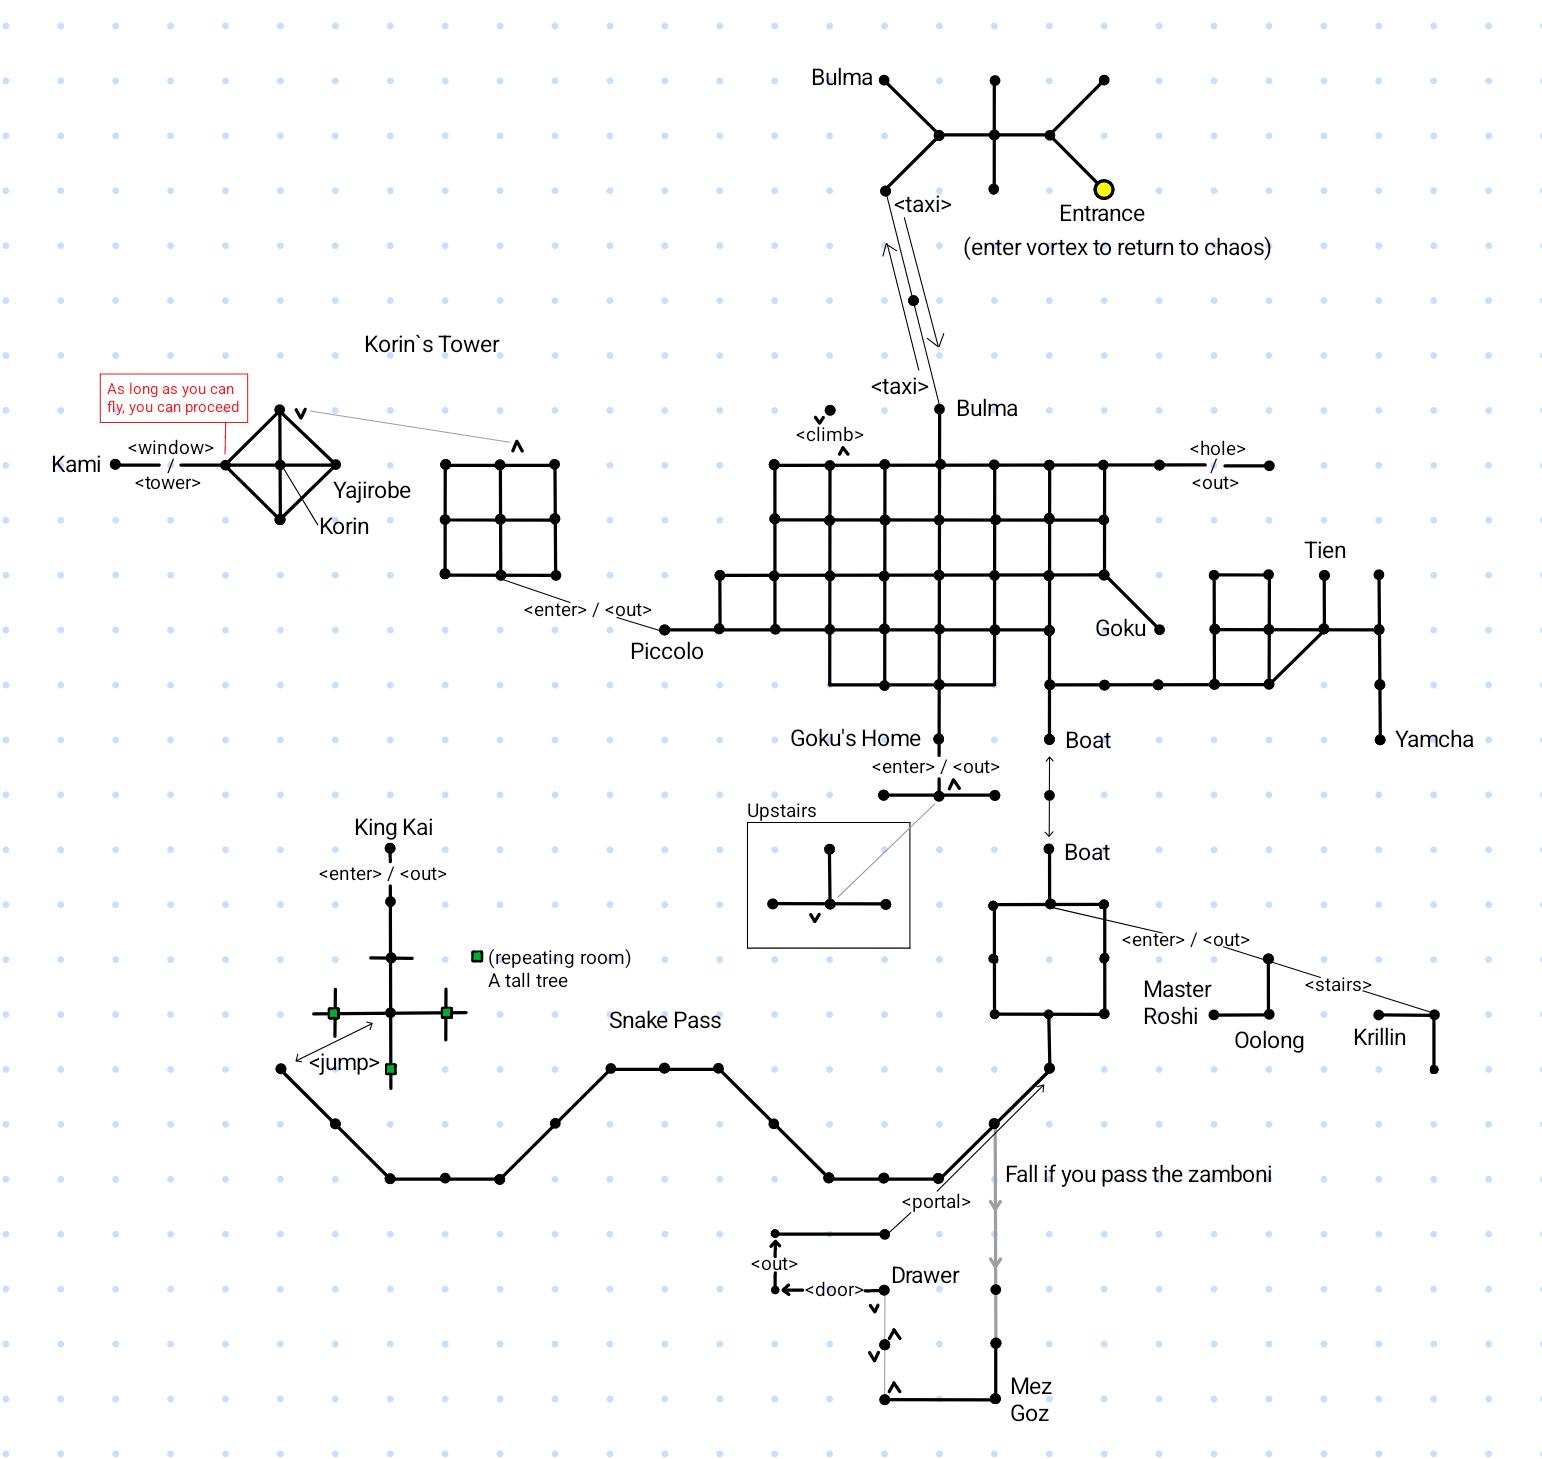 Map of Dragonball Z